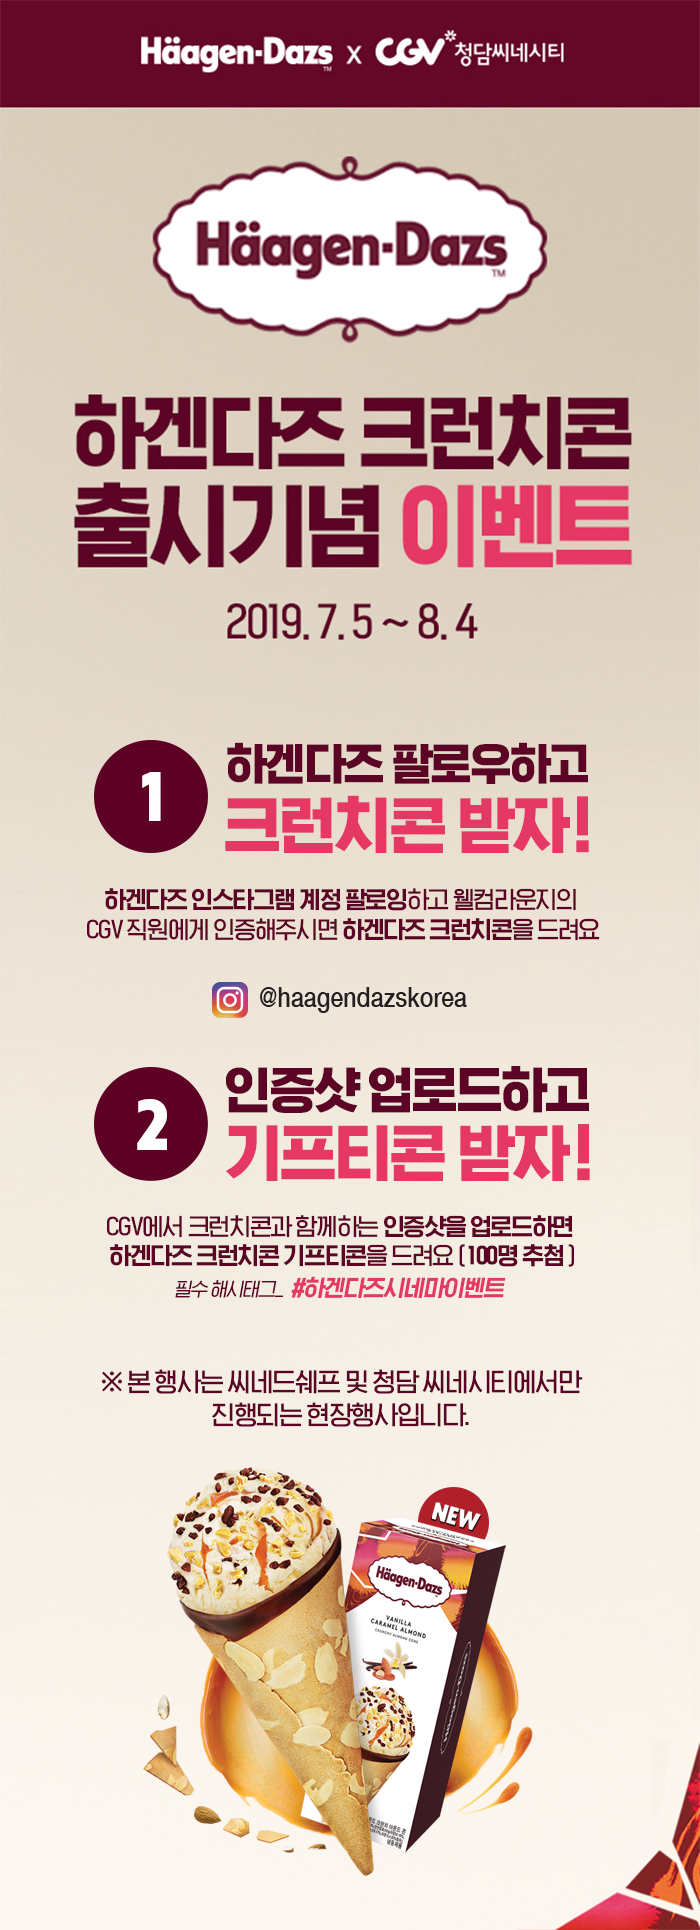 CGV극장별 [CGV청담씨네시티] 하겐다즈 크런치콘 출시기념 이벤트!